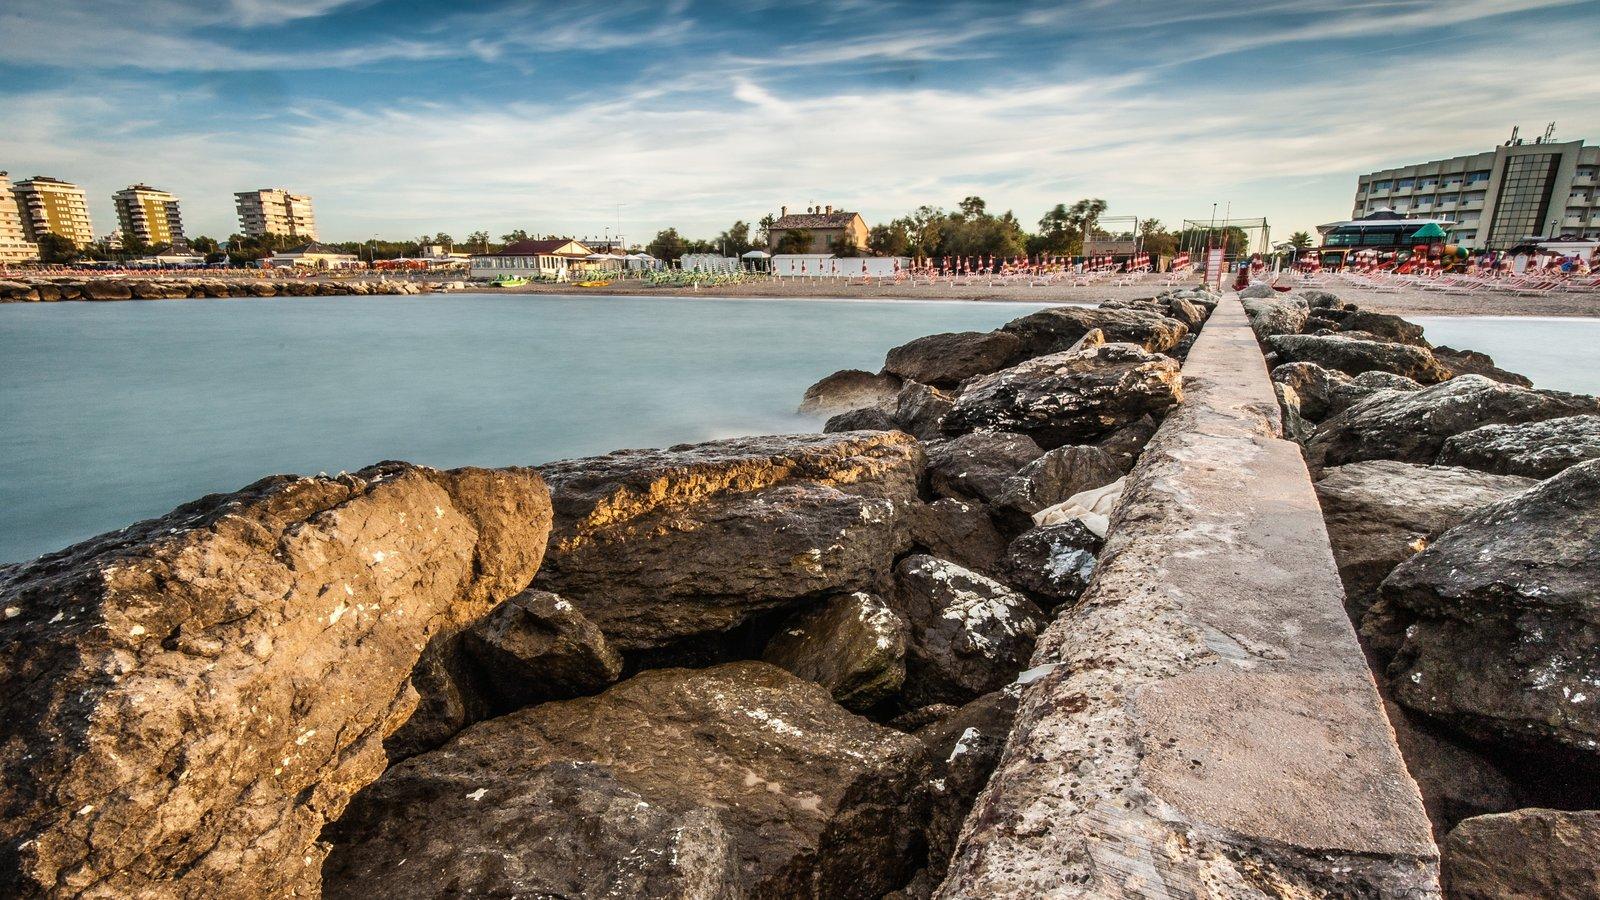 Riccione featuring rocky coastline